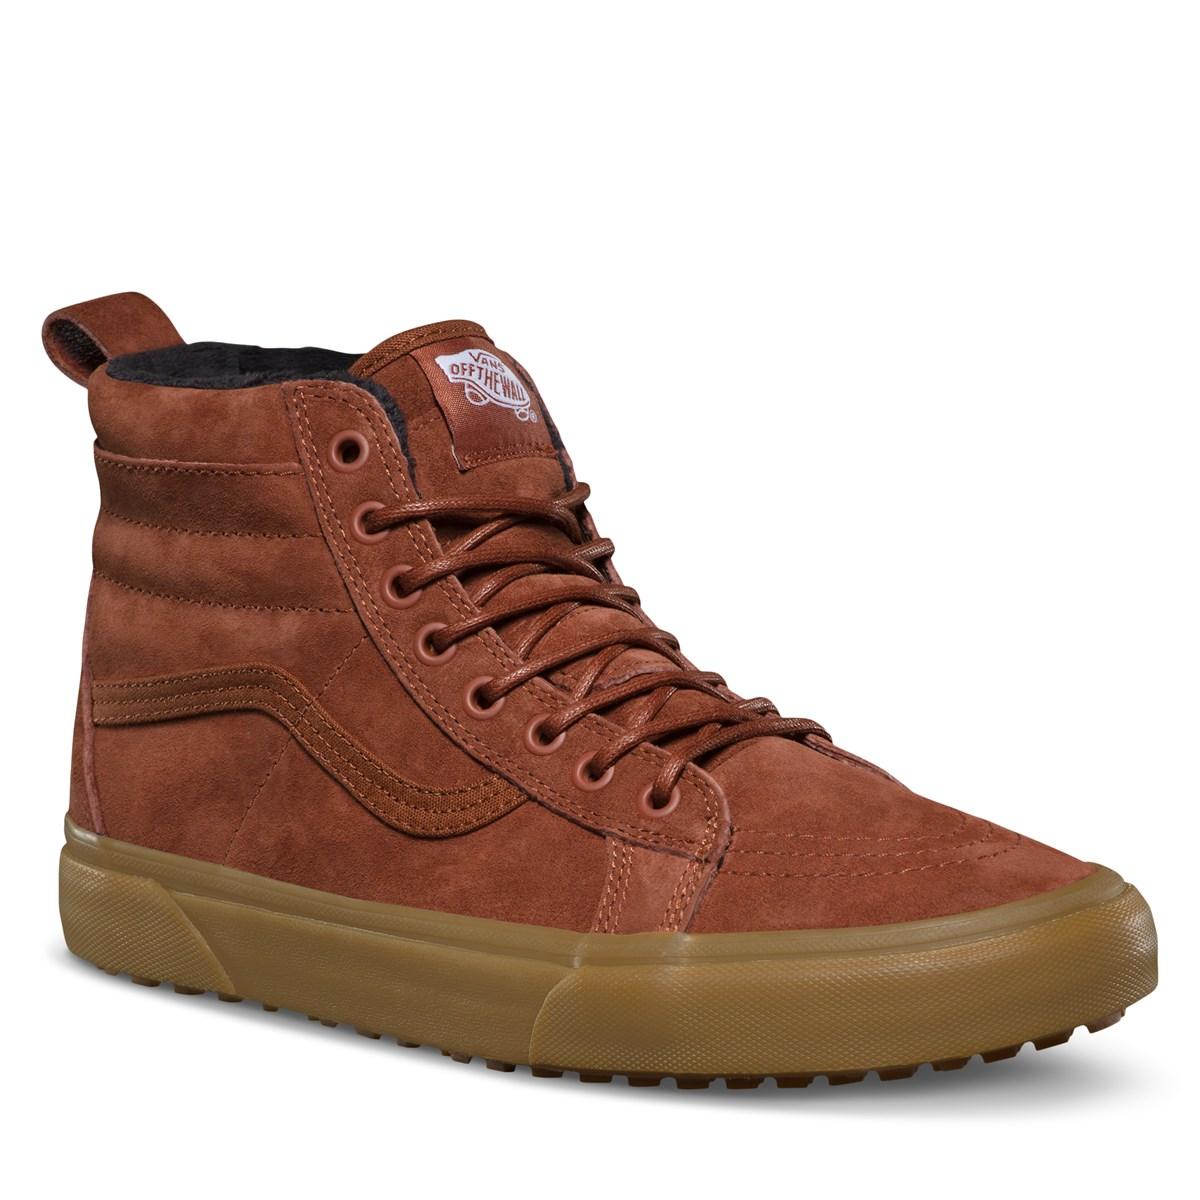 Men's SK8 Hi MTE Sneakers in Brown